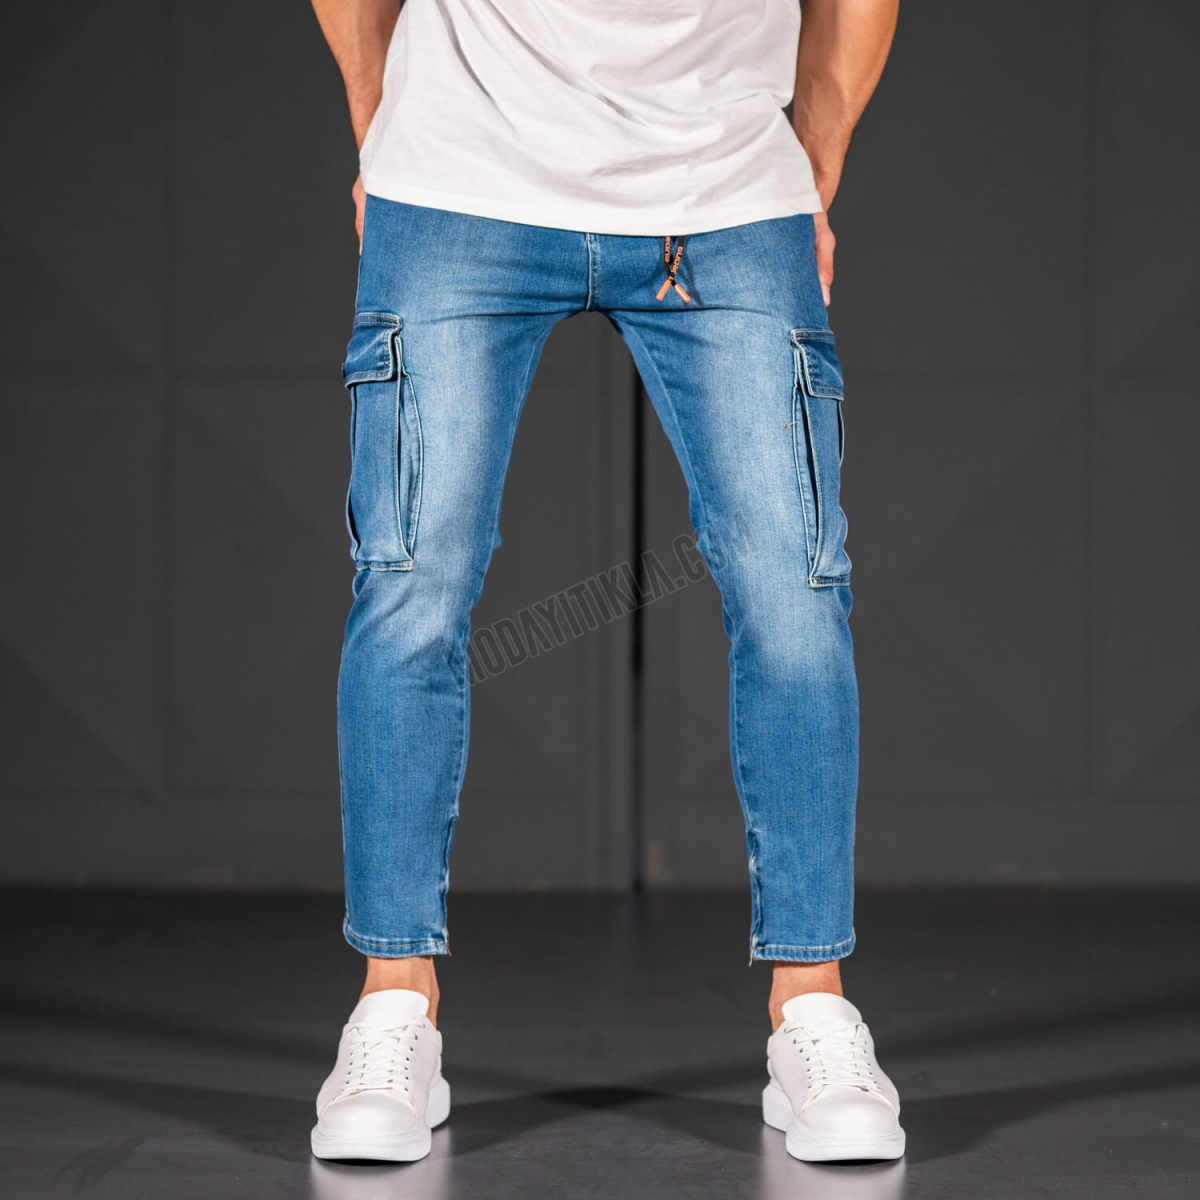 Erkek Dar Paça Kargo Cep Jeans